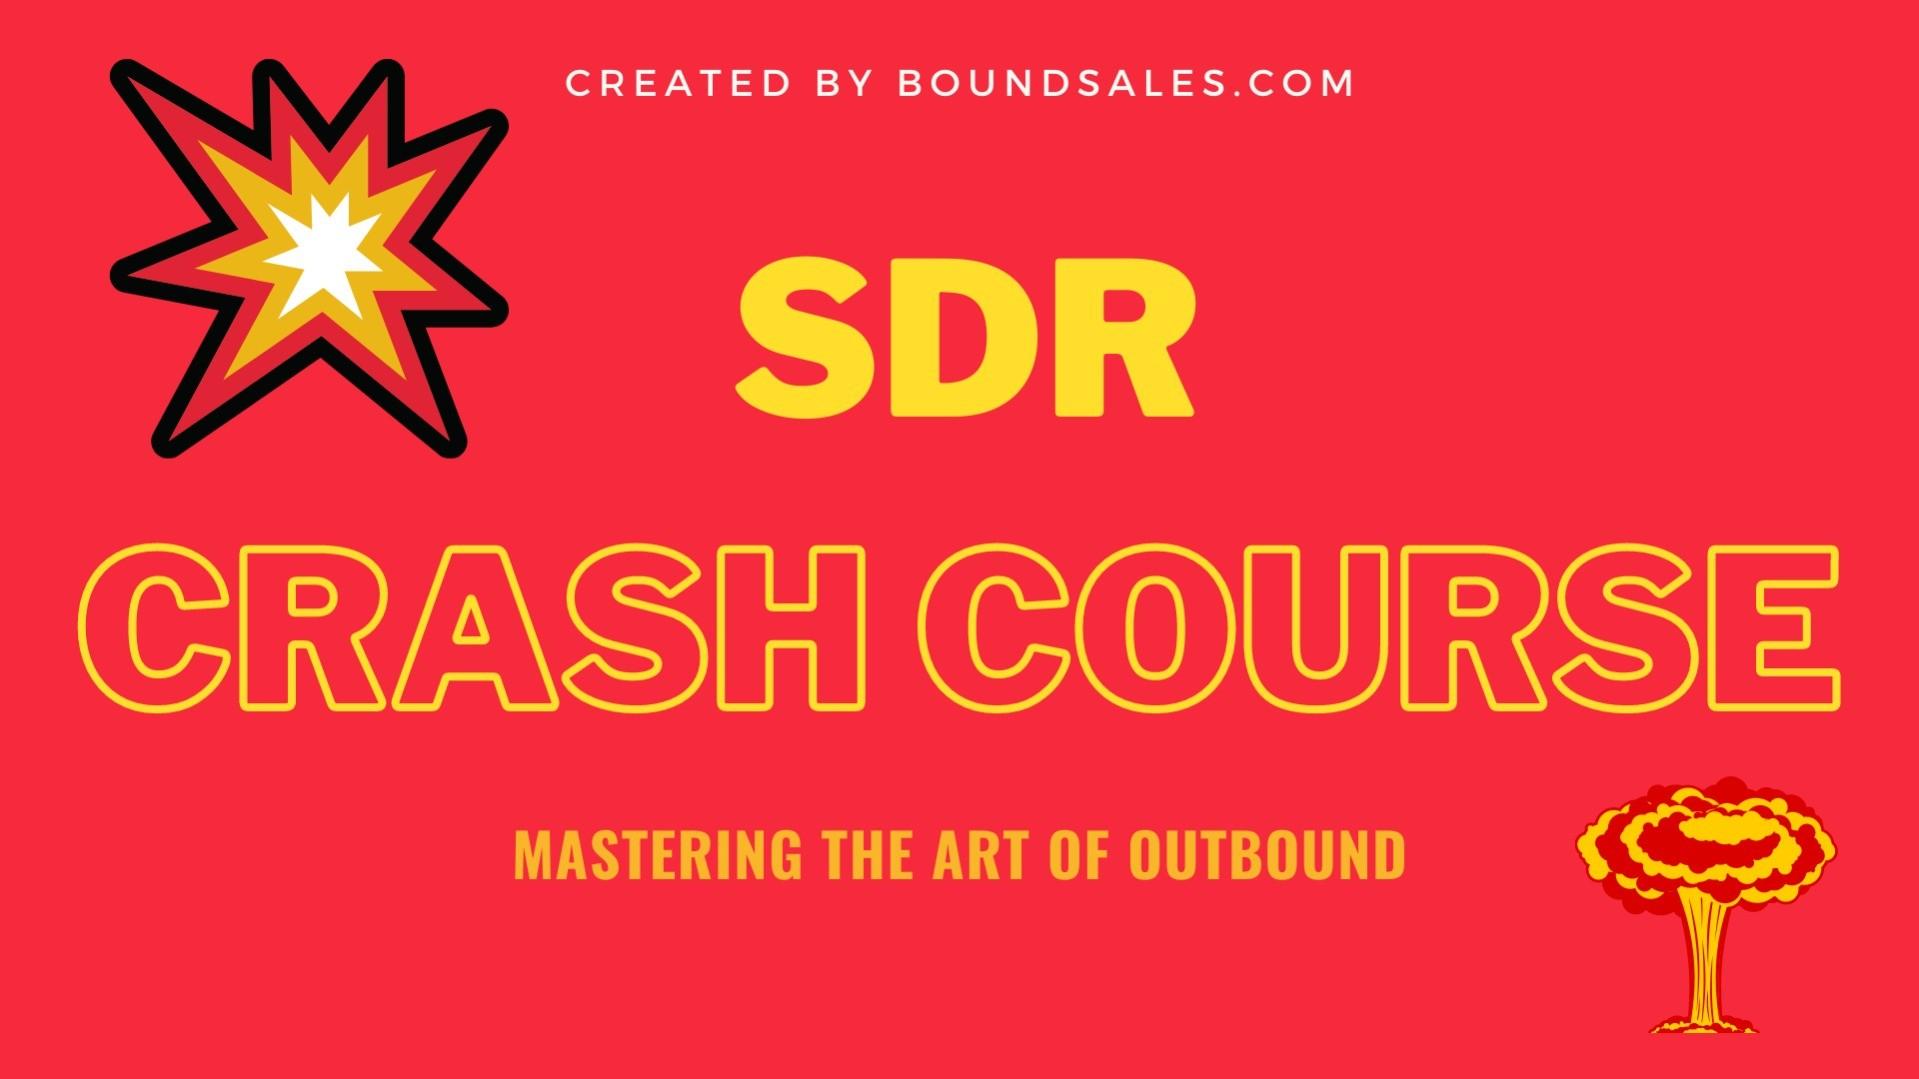 AppSumo Deal for SDR Crash Course